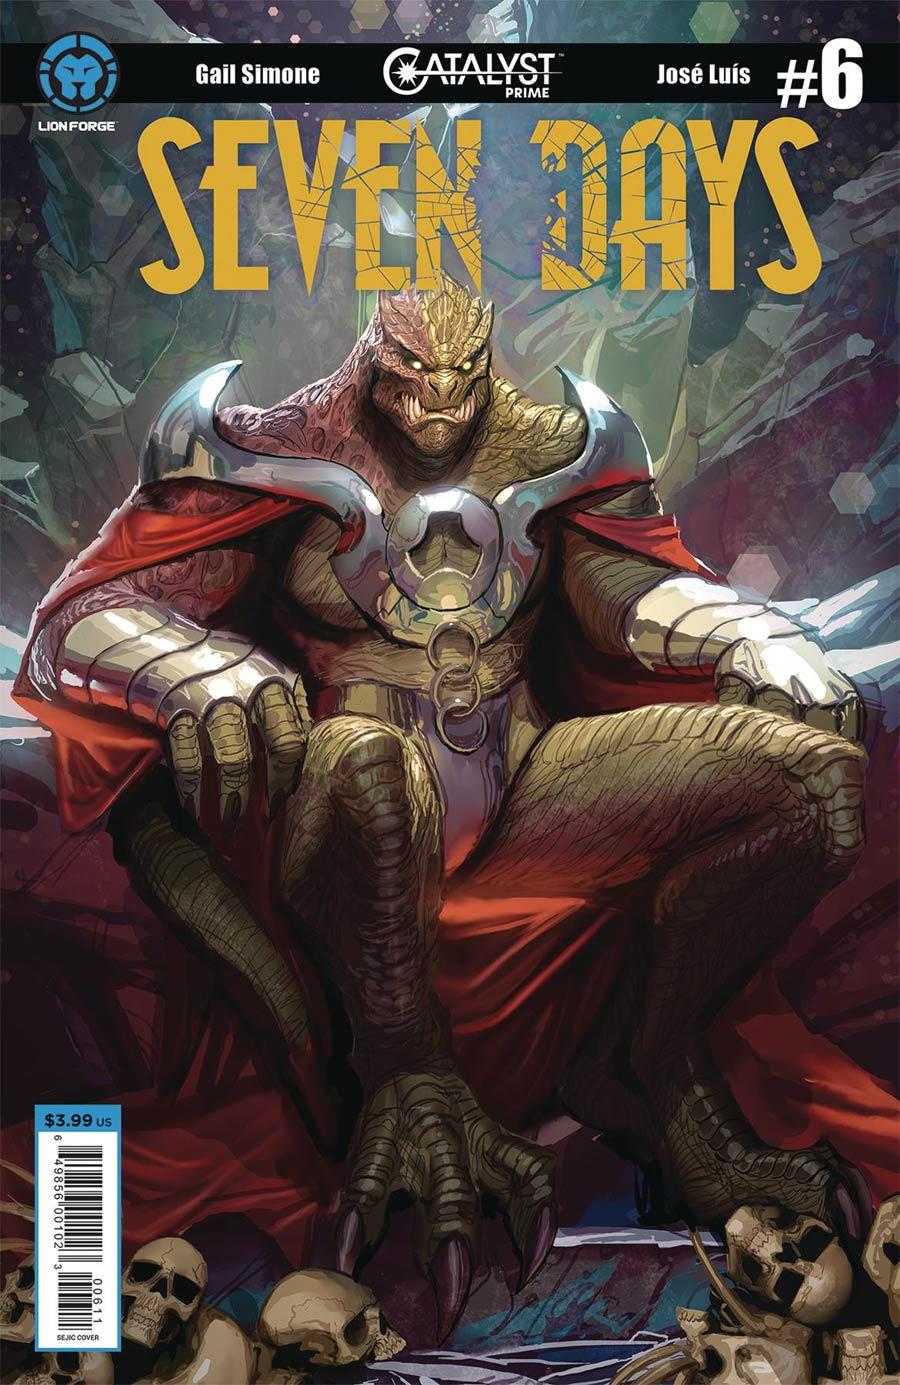 Catalyst Prime Seven Days #6 Cover A Regular Stjepan Sejic Cover